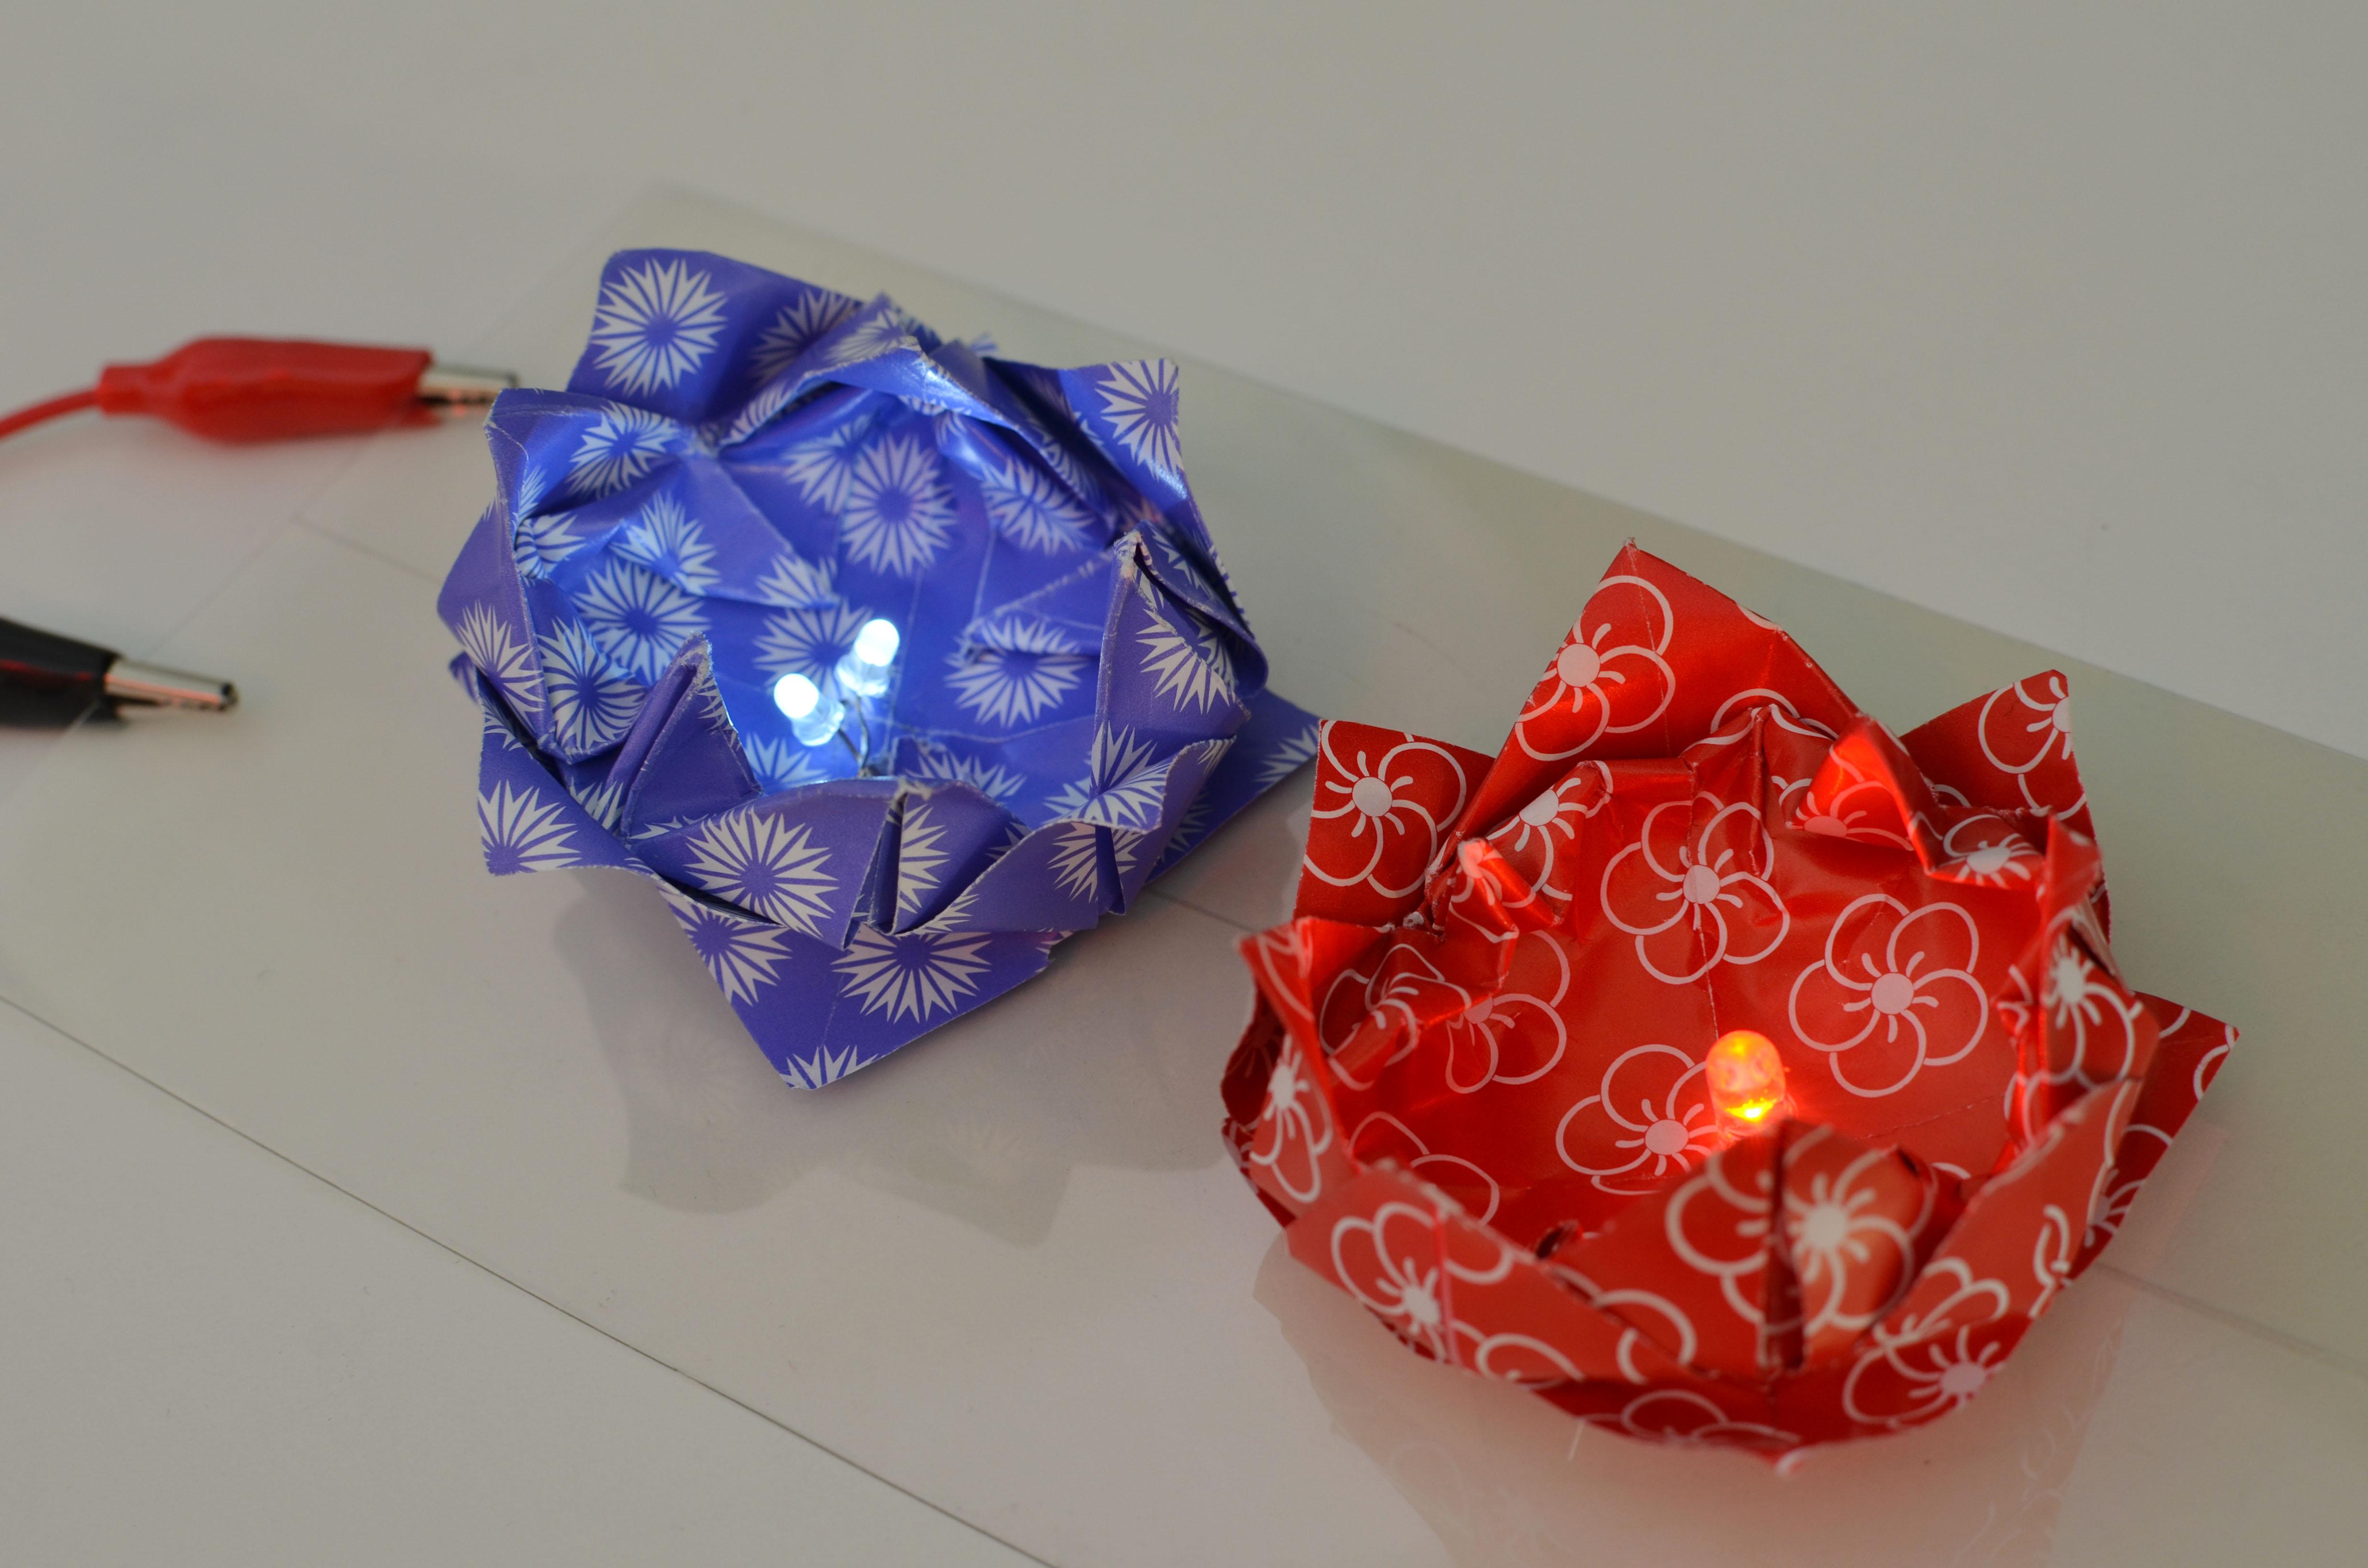 braincrafts_lotus_origami_led_setup.jpg